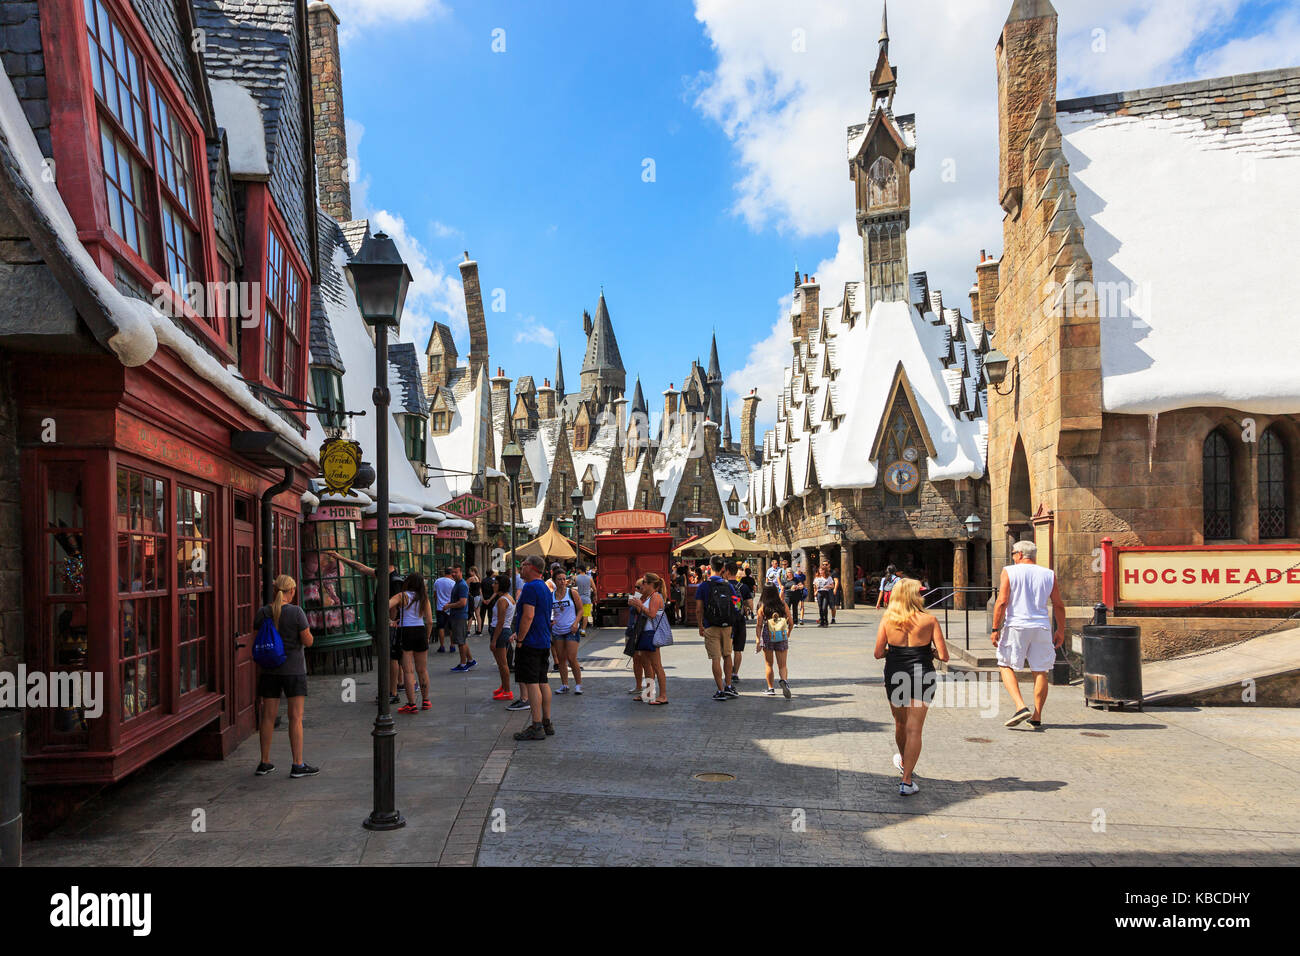 Harry Potter part of Universal Studios theme park, Orlando, Florida, USA - Stock Image